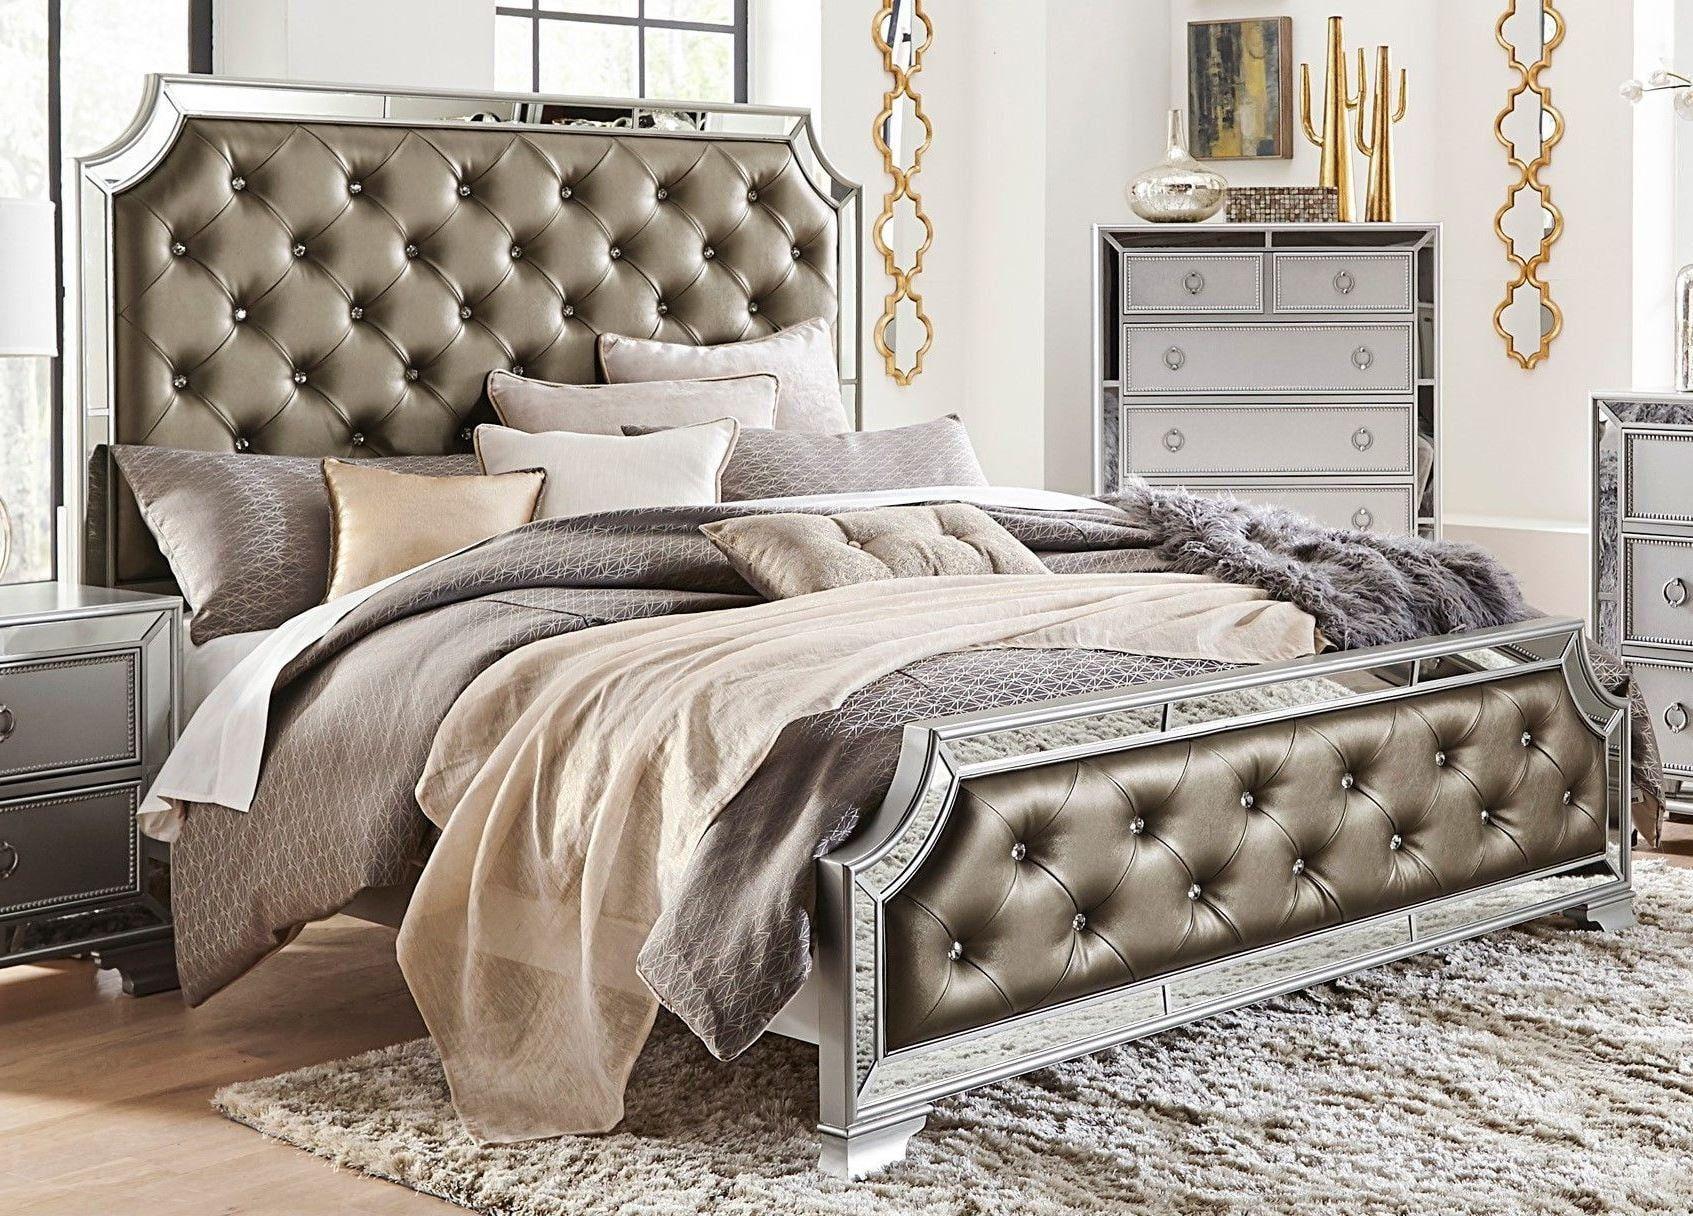 Coralayne Silver Bedroom Set In 2020 Silver Bedroom Bedroom Sets Bedroom Panel